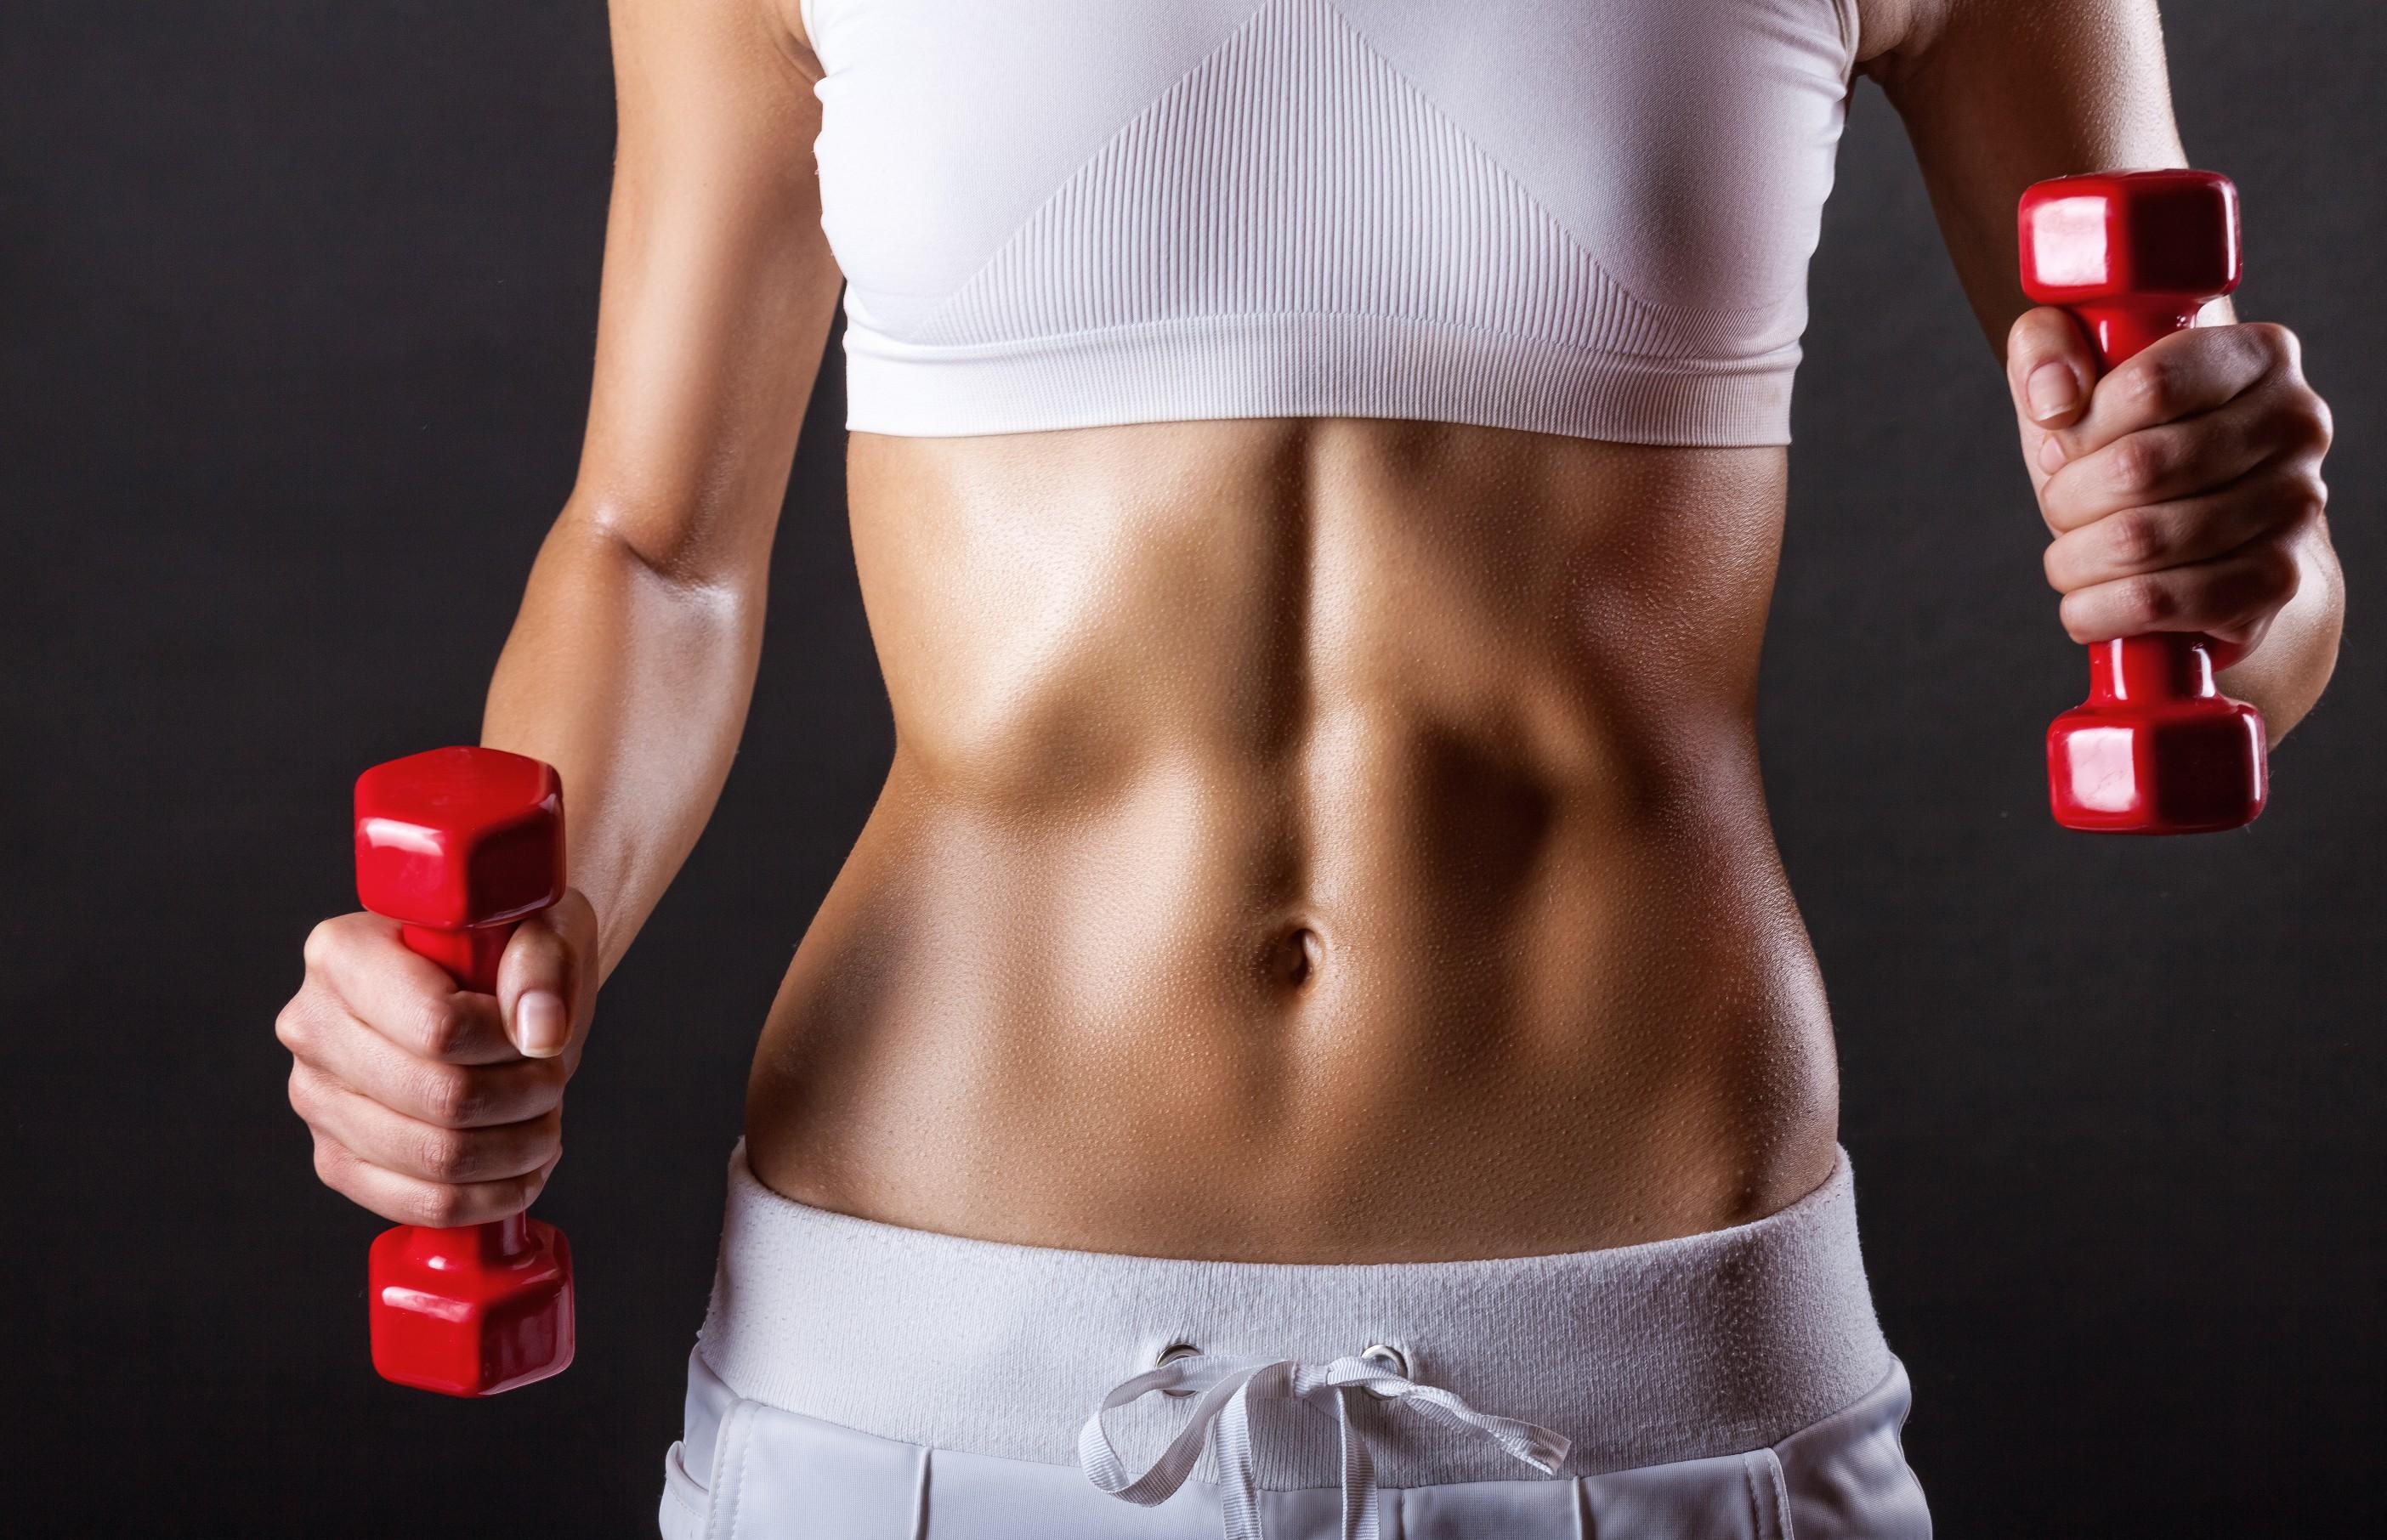 People 2808x1812 women fitness model sport  model dumbbells abs sports bra weightlifting